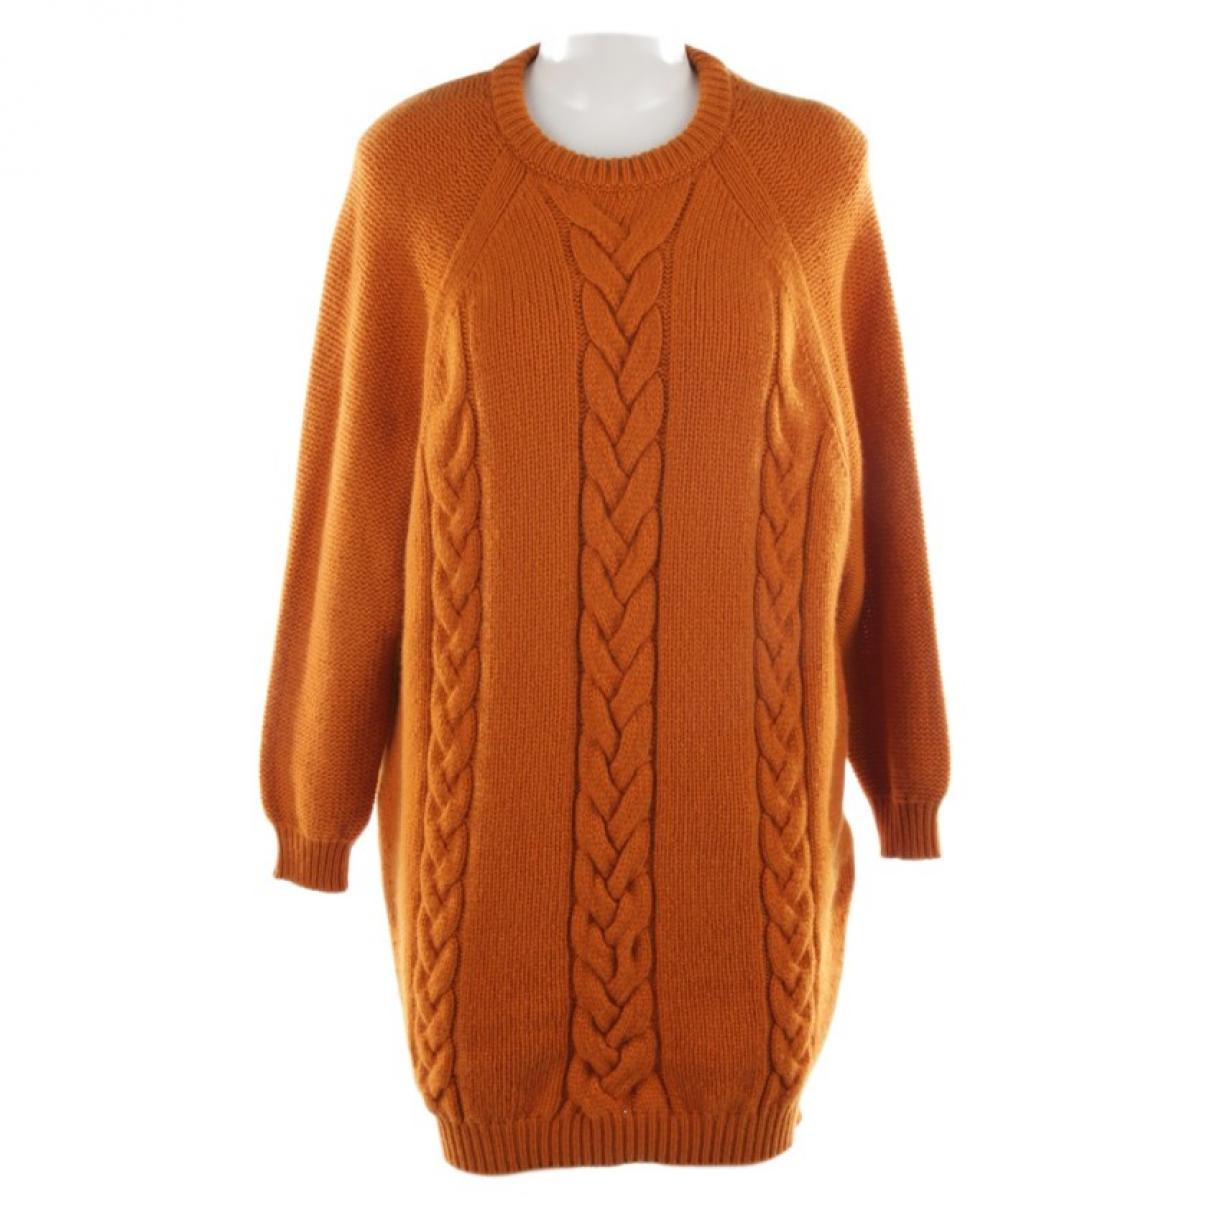 Autre Marque \N Orange Cashmere Knitwear for Women 36 FR